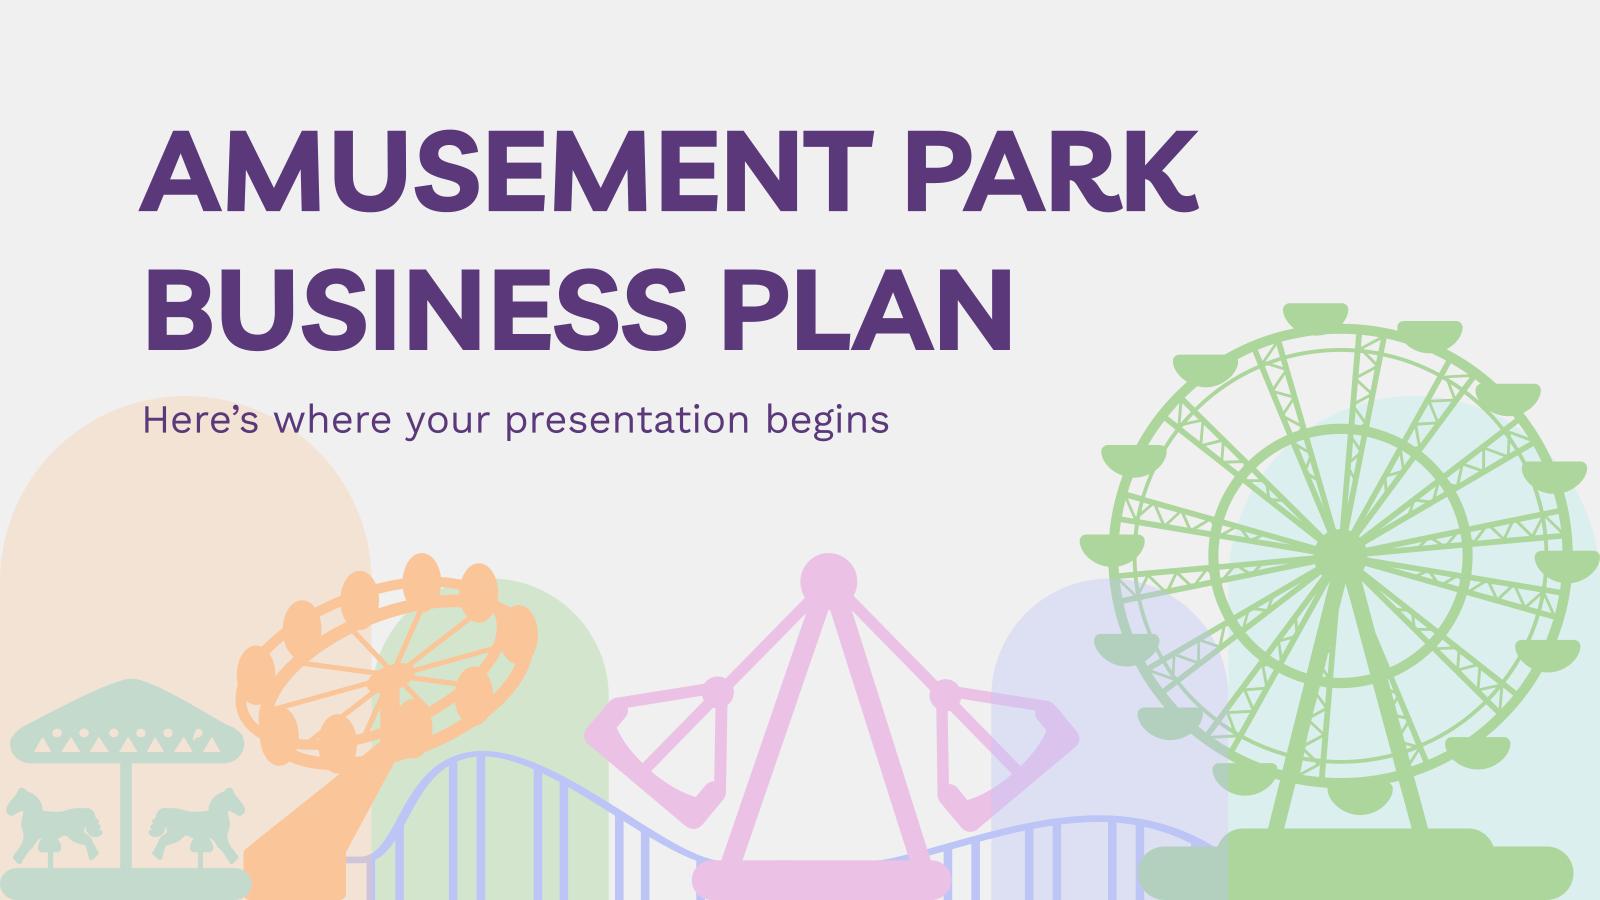 Amusement Park Business Plan presentation template